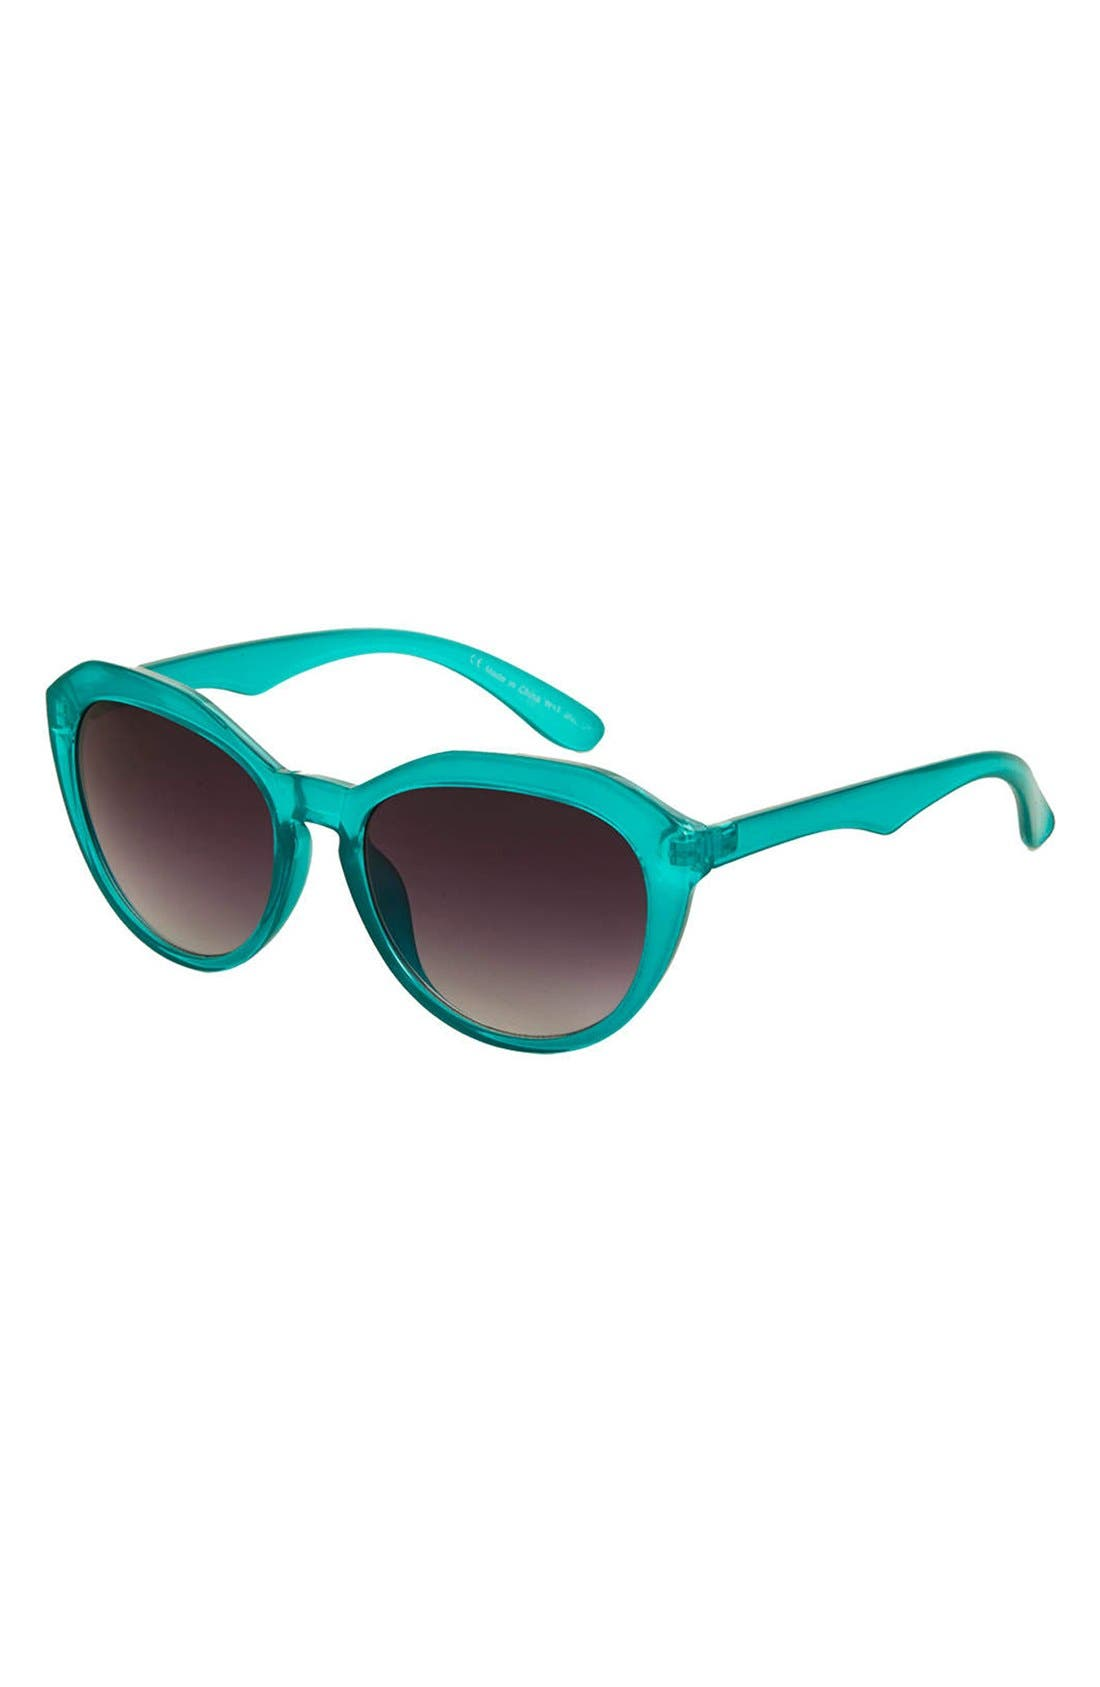 Alternate Image 1 Selected - Topshop 'Serene' 50mm Cat Eye Sunglasses